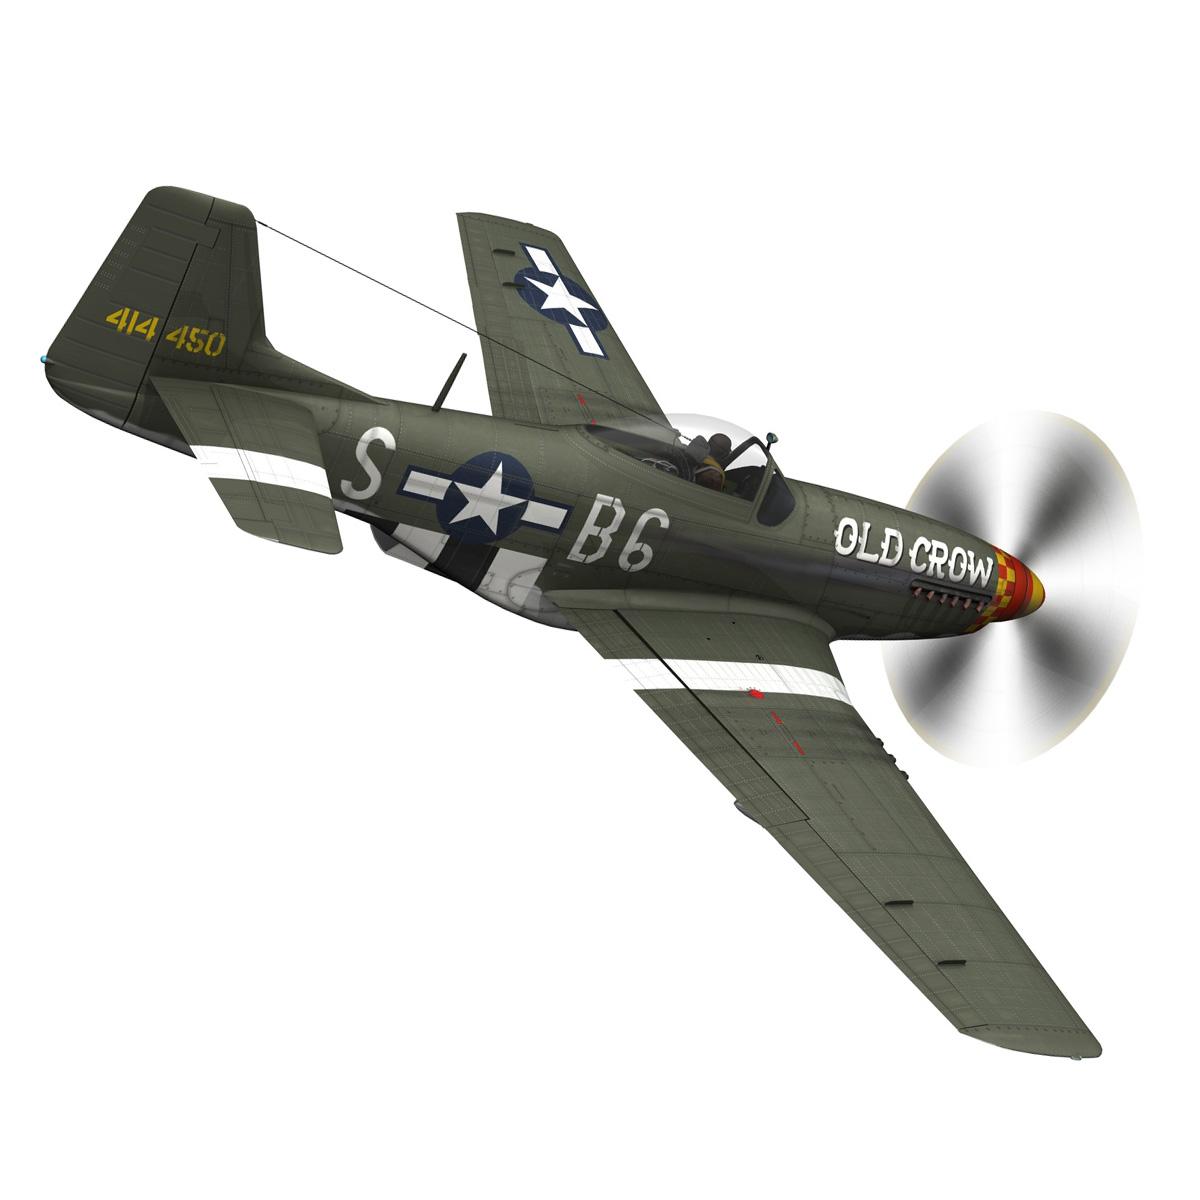 north american p-51d mustang – old crow 3d model fbx c4d lwo obj 273337